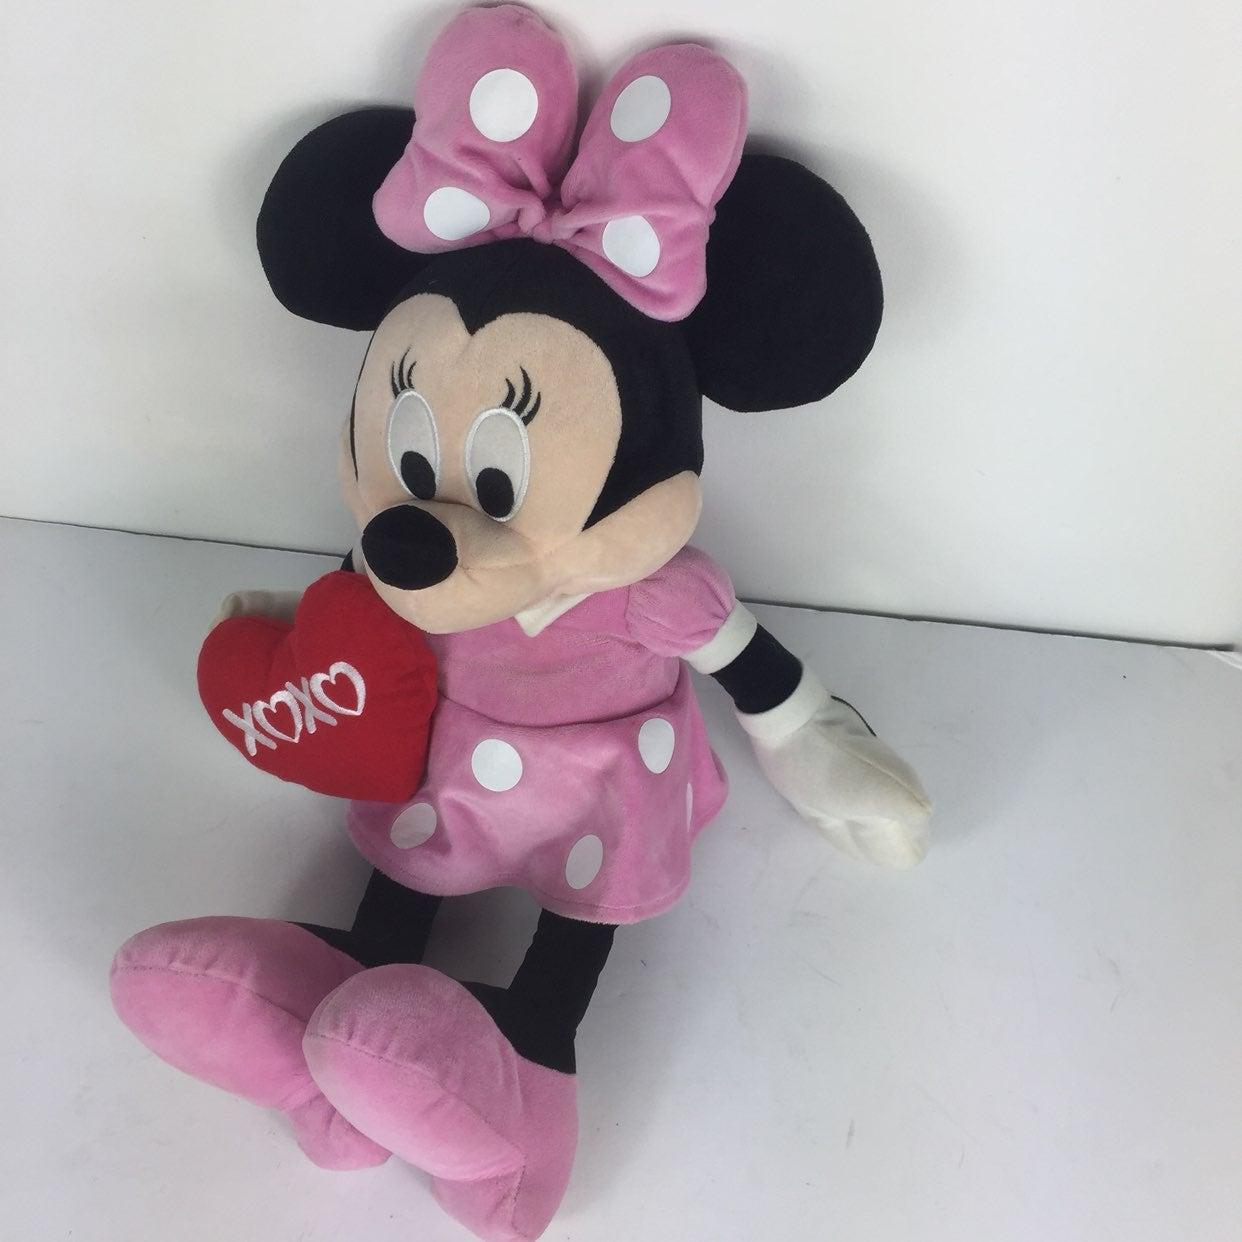 Disney Minnie Mouse Plush Toy Doll